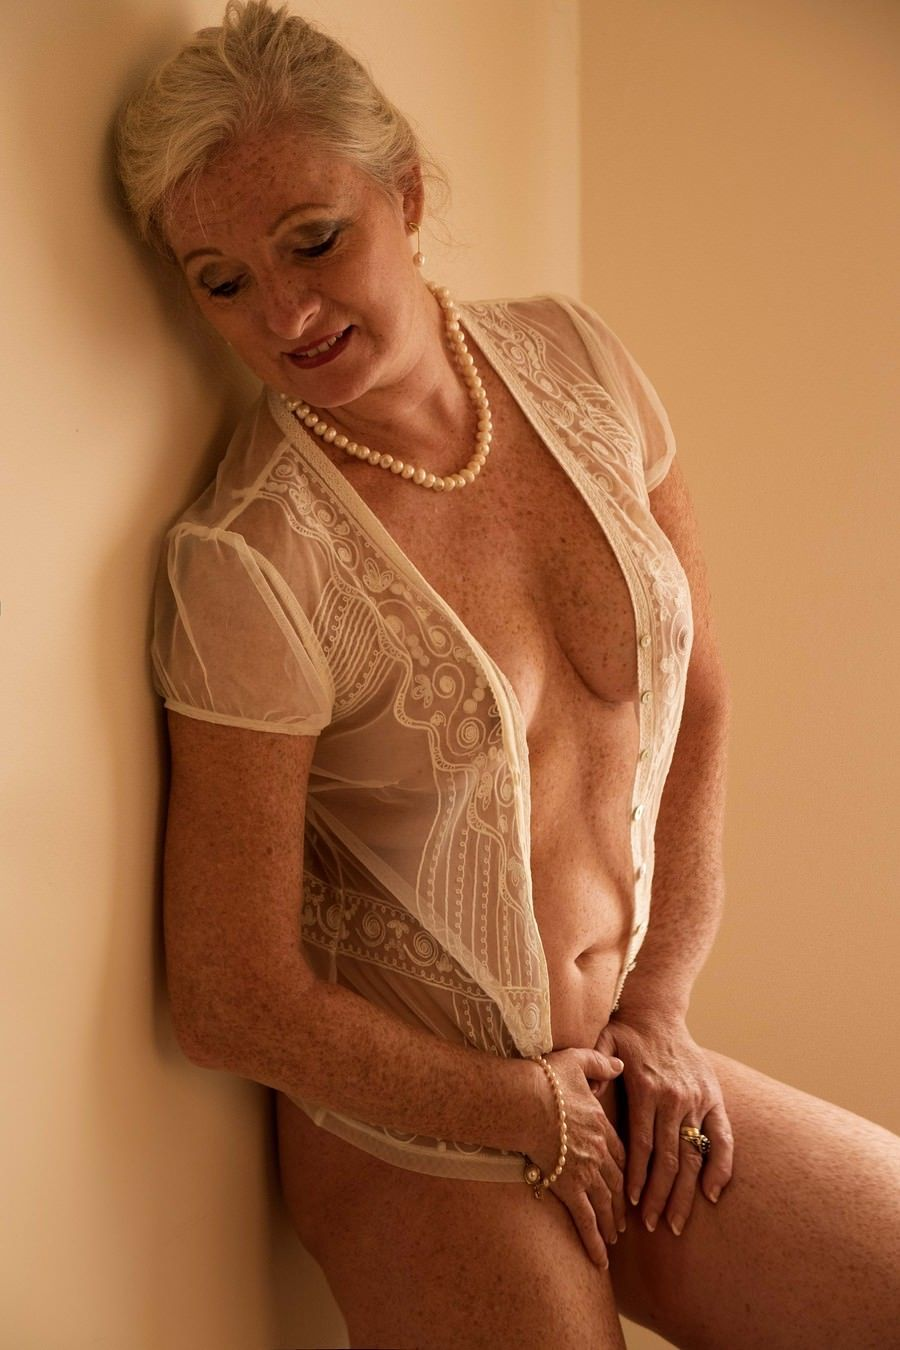 Pin On Hot Older Women-6280